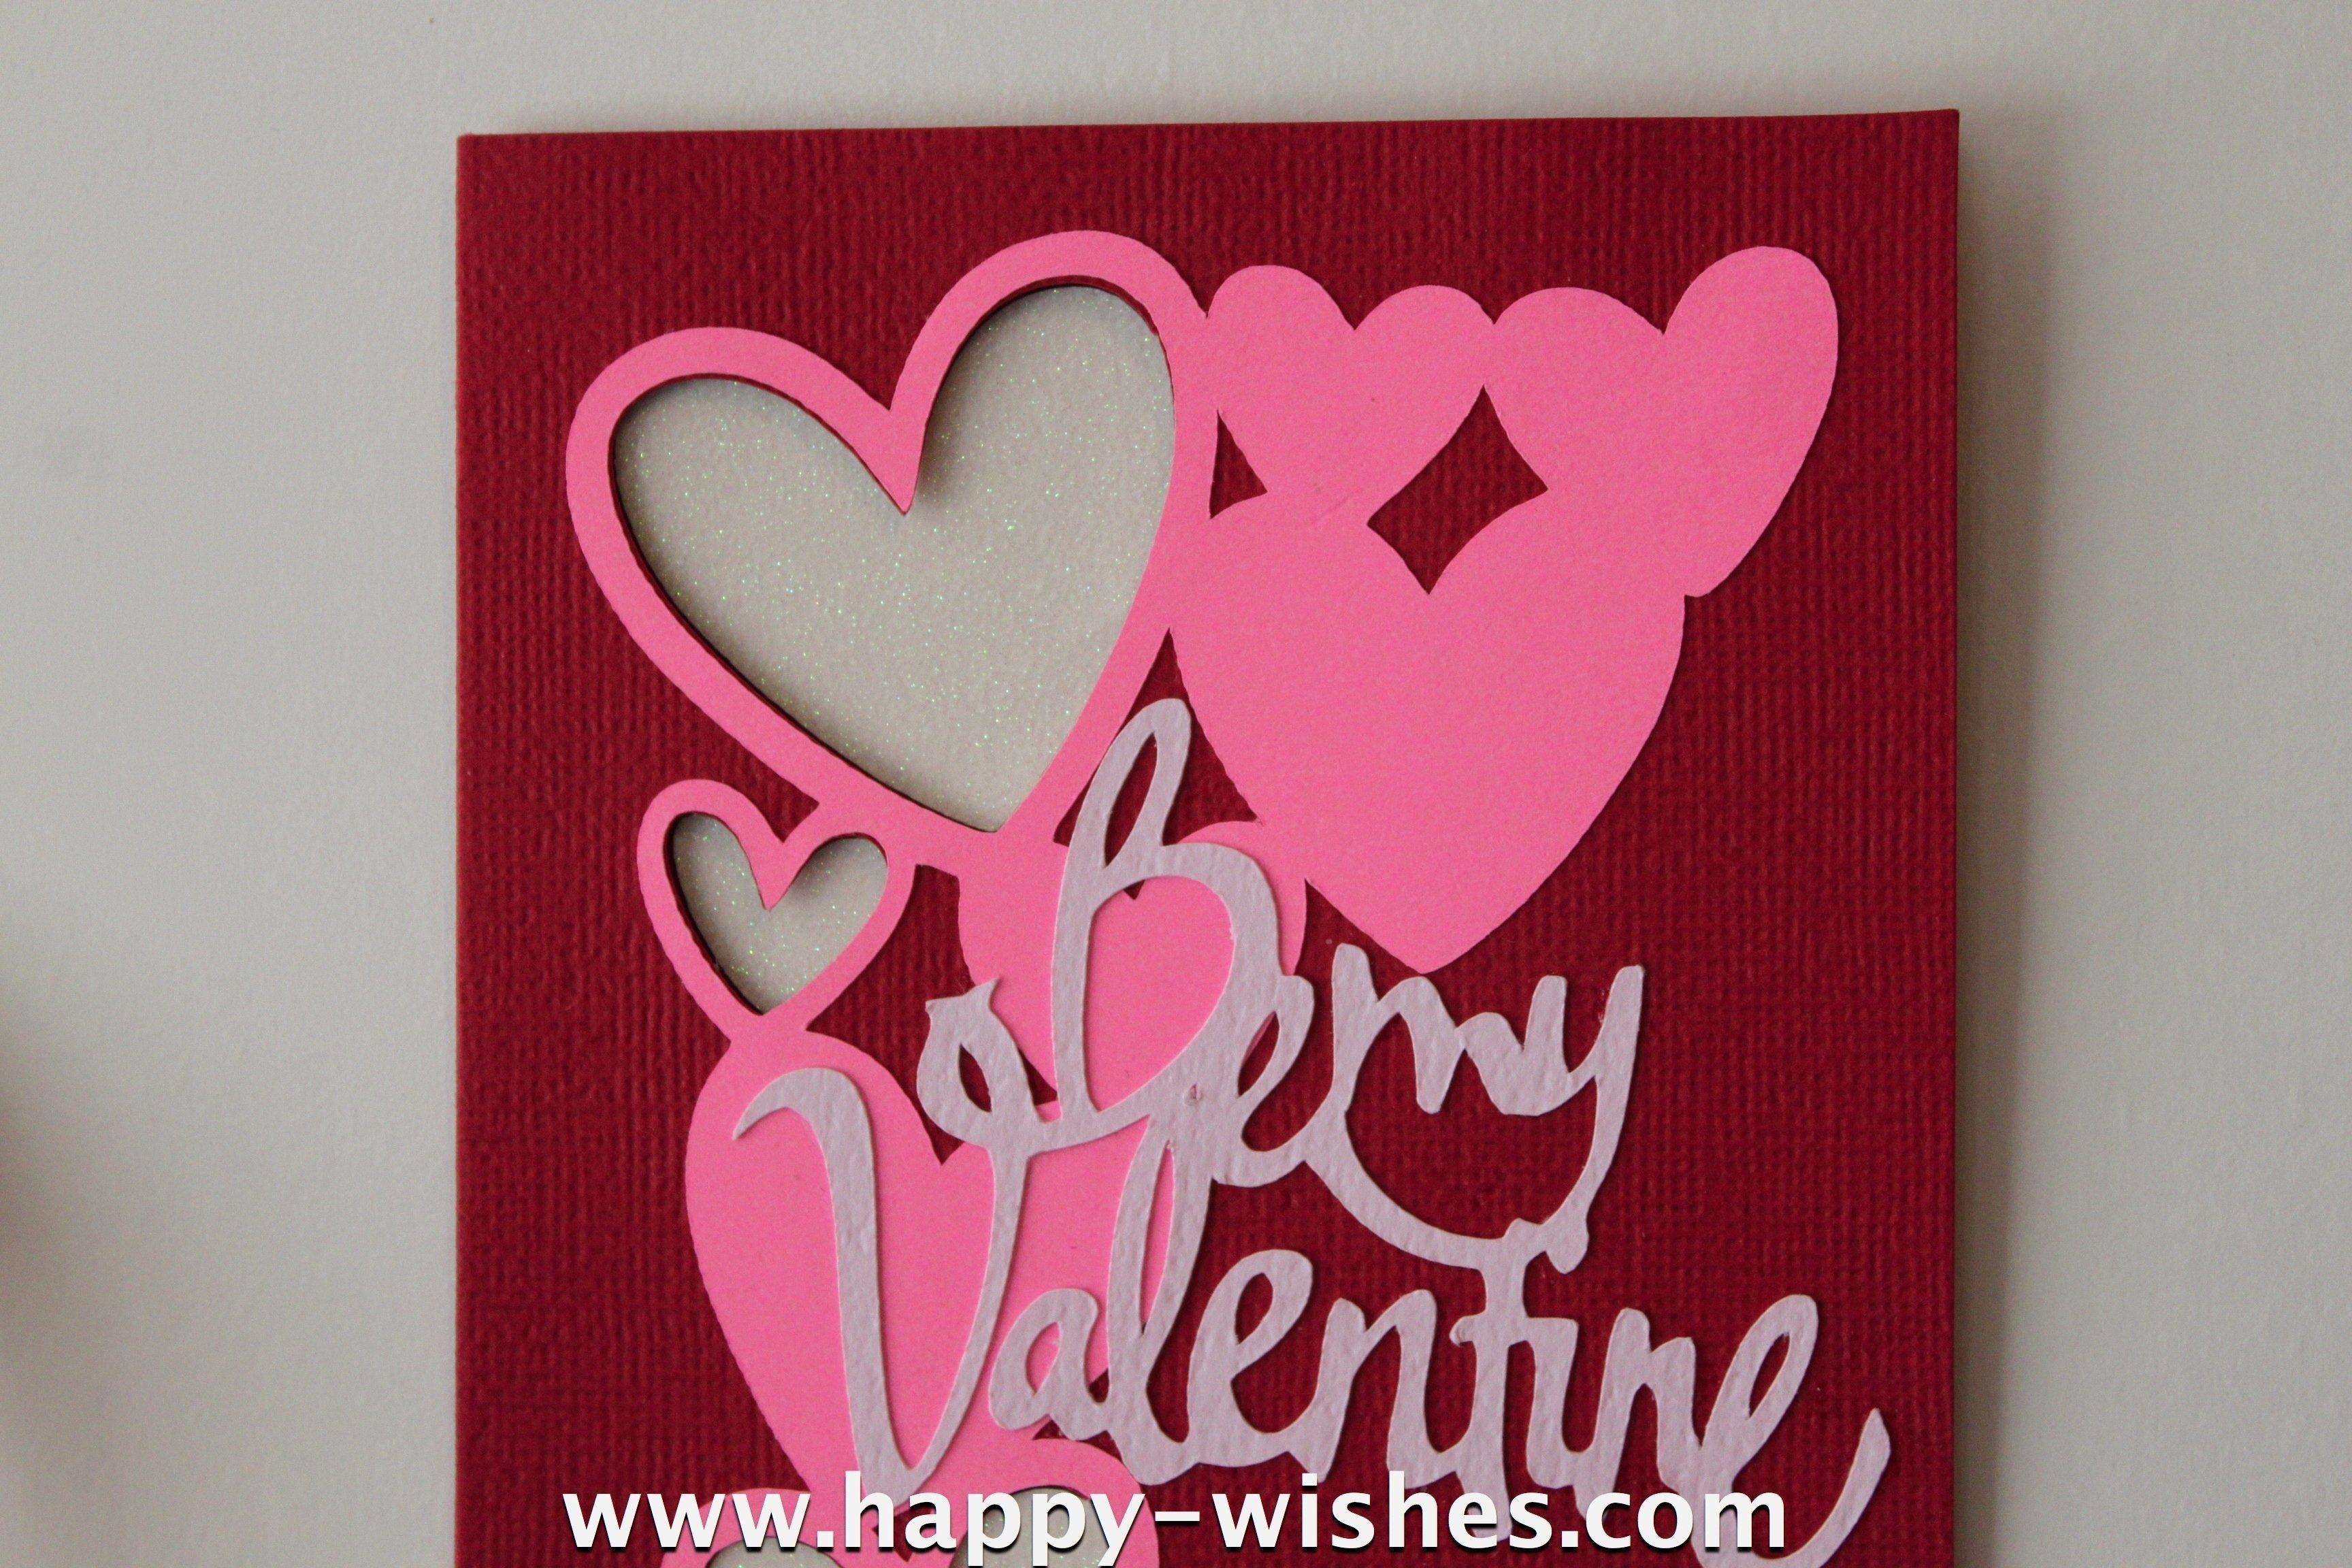 10 Stunning Valentine Card Ideas For Him creative diy card diy day card ideas tutorials crafts booming to 1